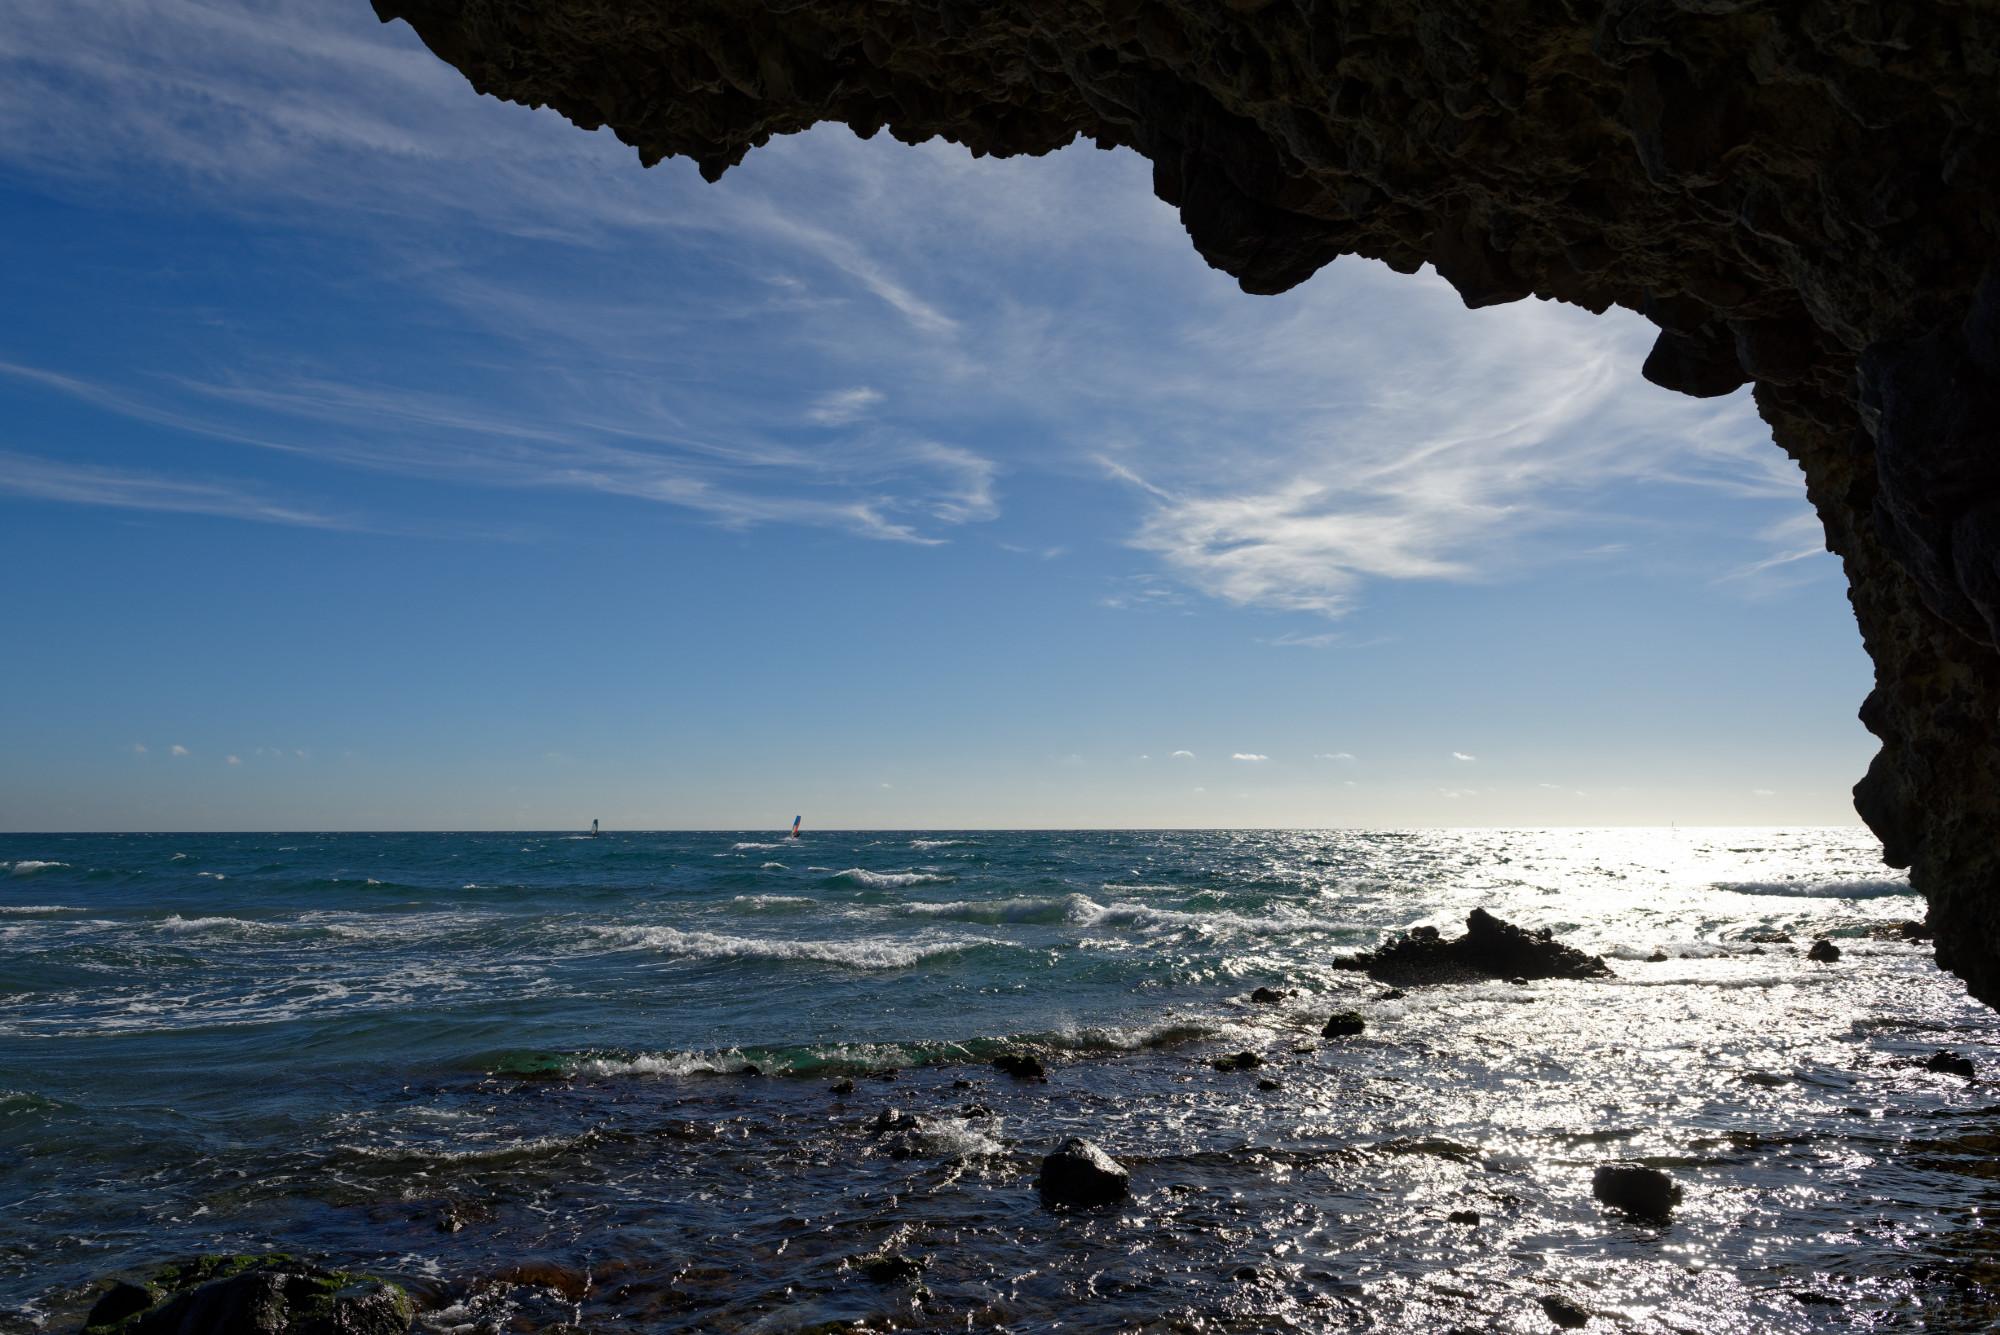 171214-San Jose-Playa del Monsul (Cabo de Gata-Andalousie) (202)